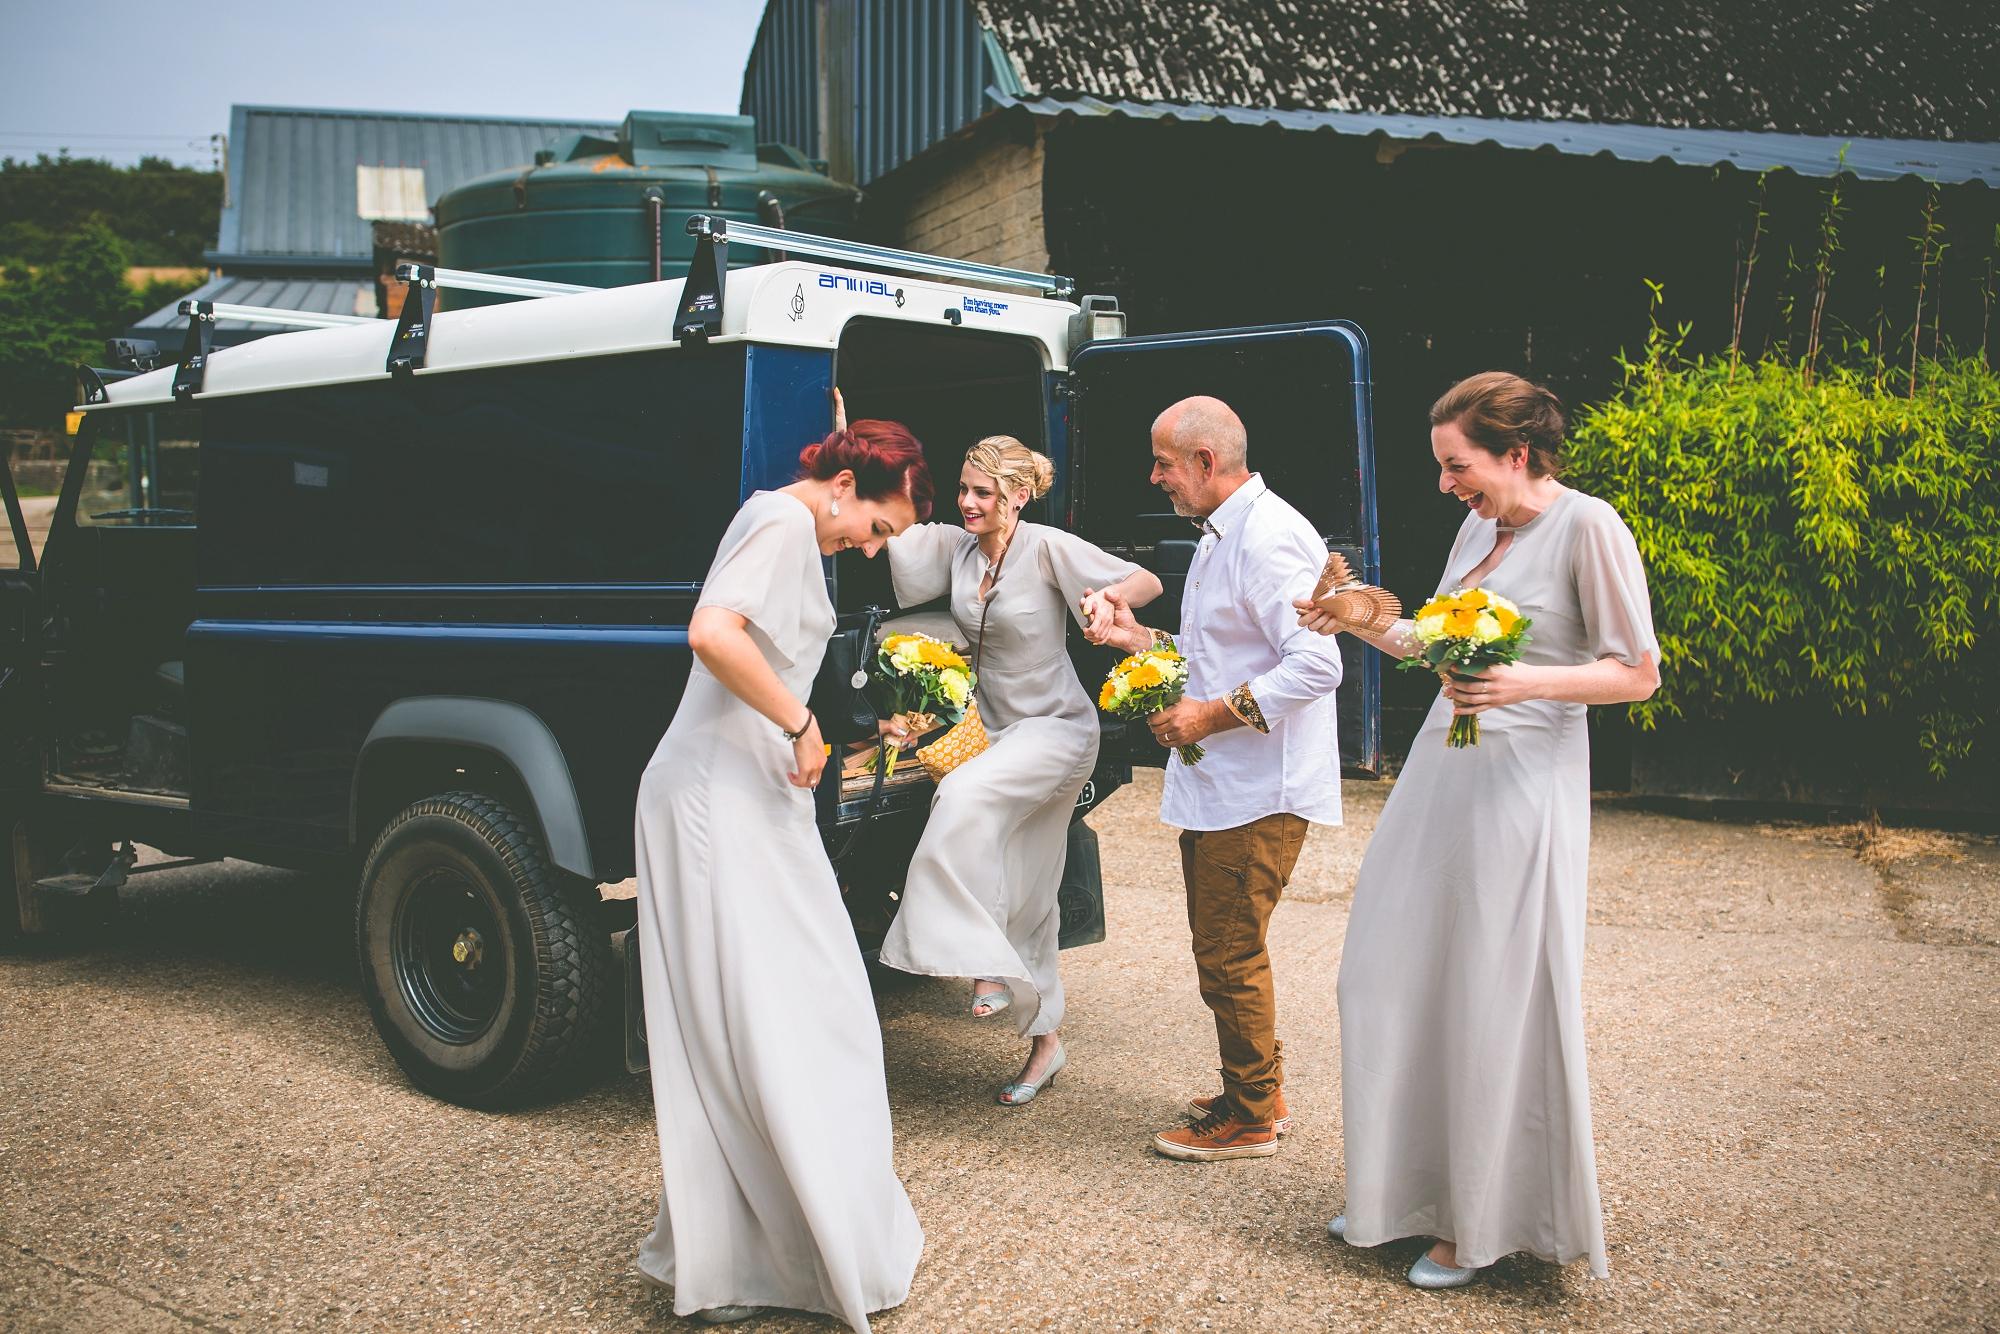 pitt_hall_barn_wedding_0037